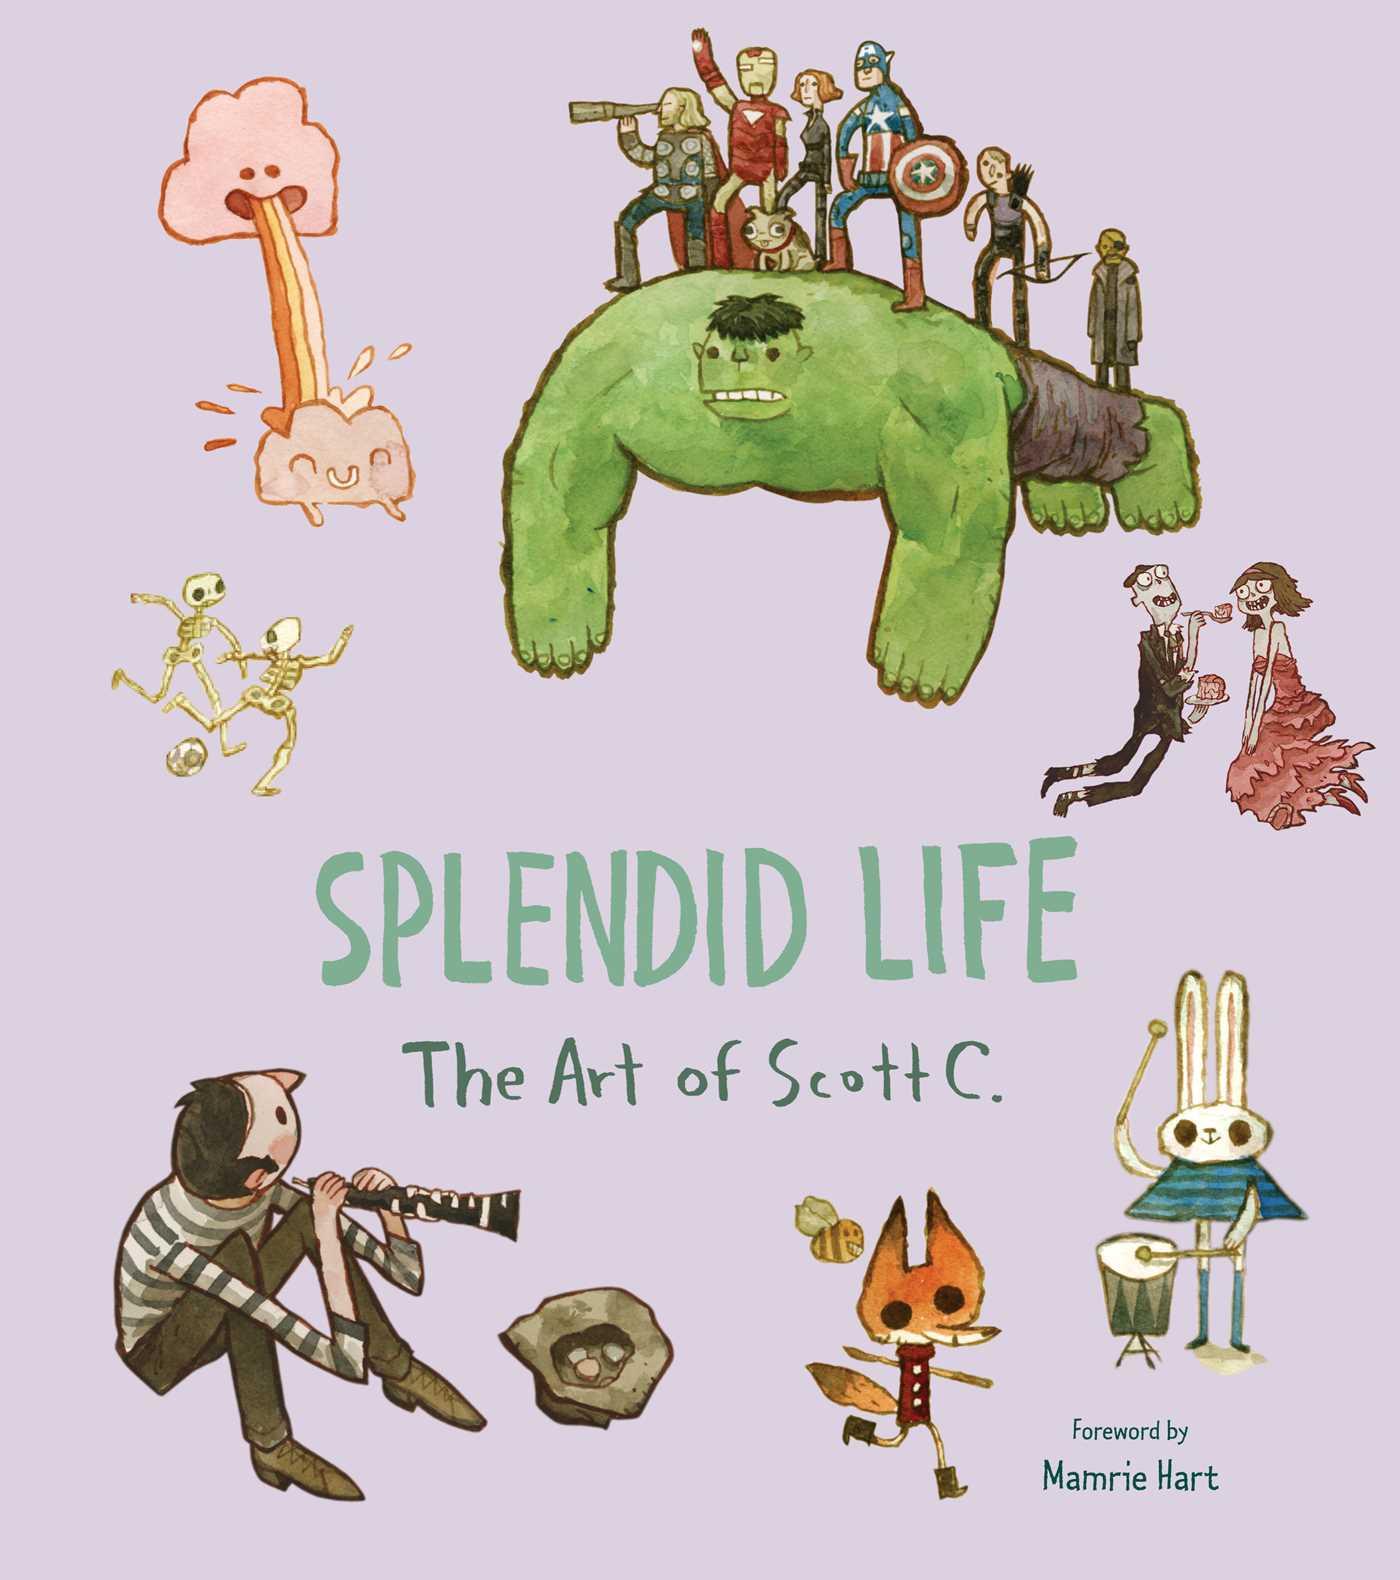 Splendid life 9781683831013 hr